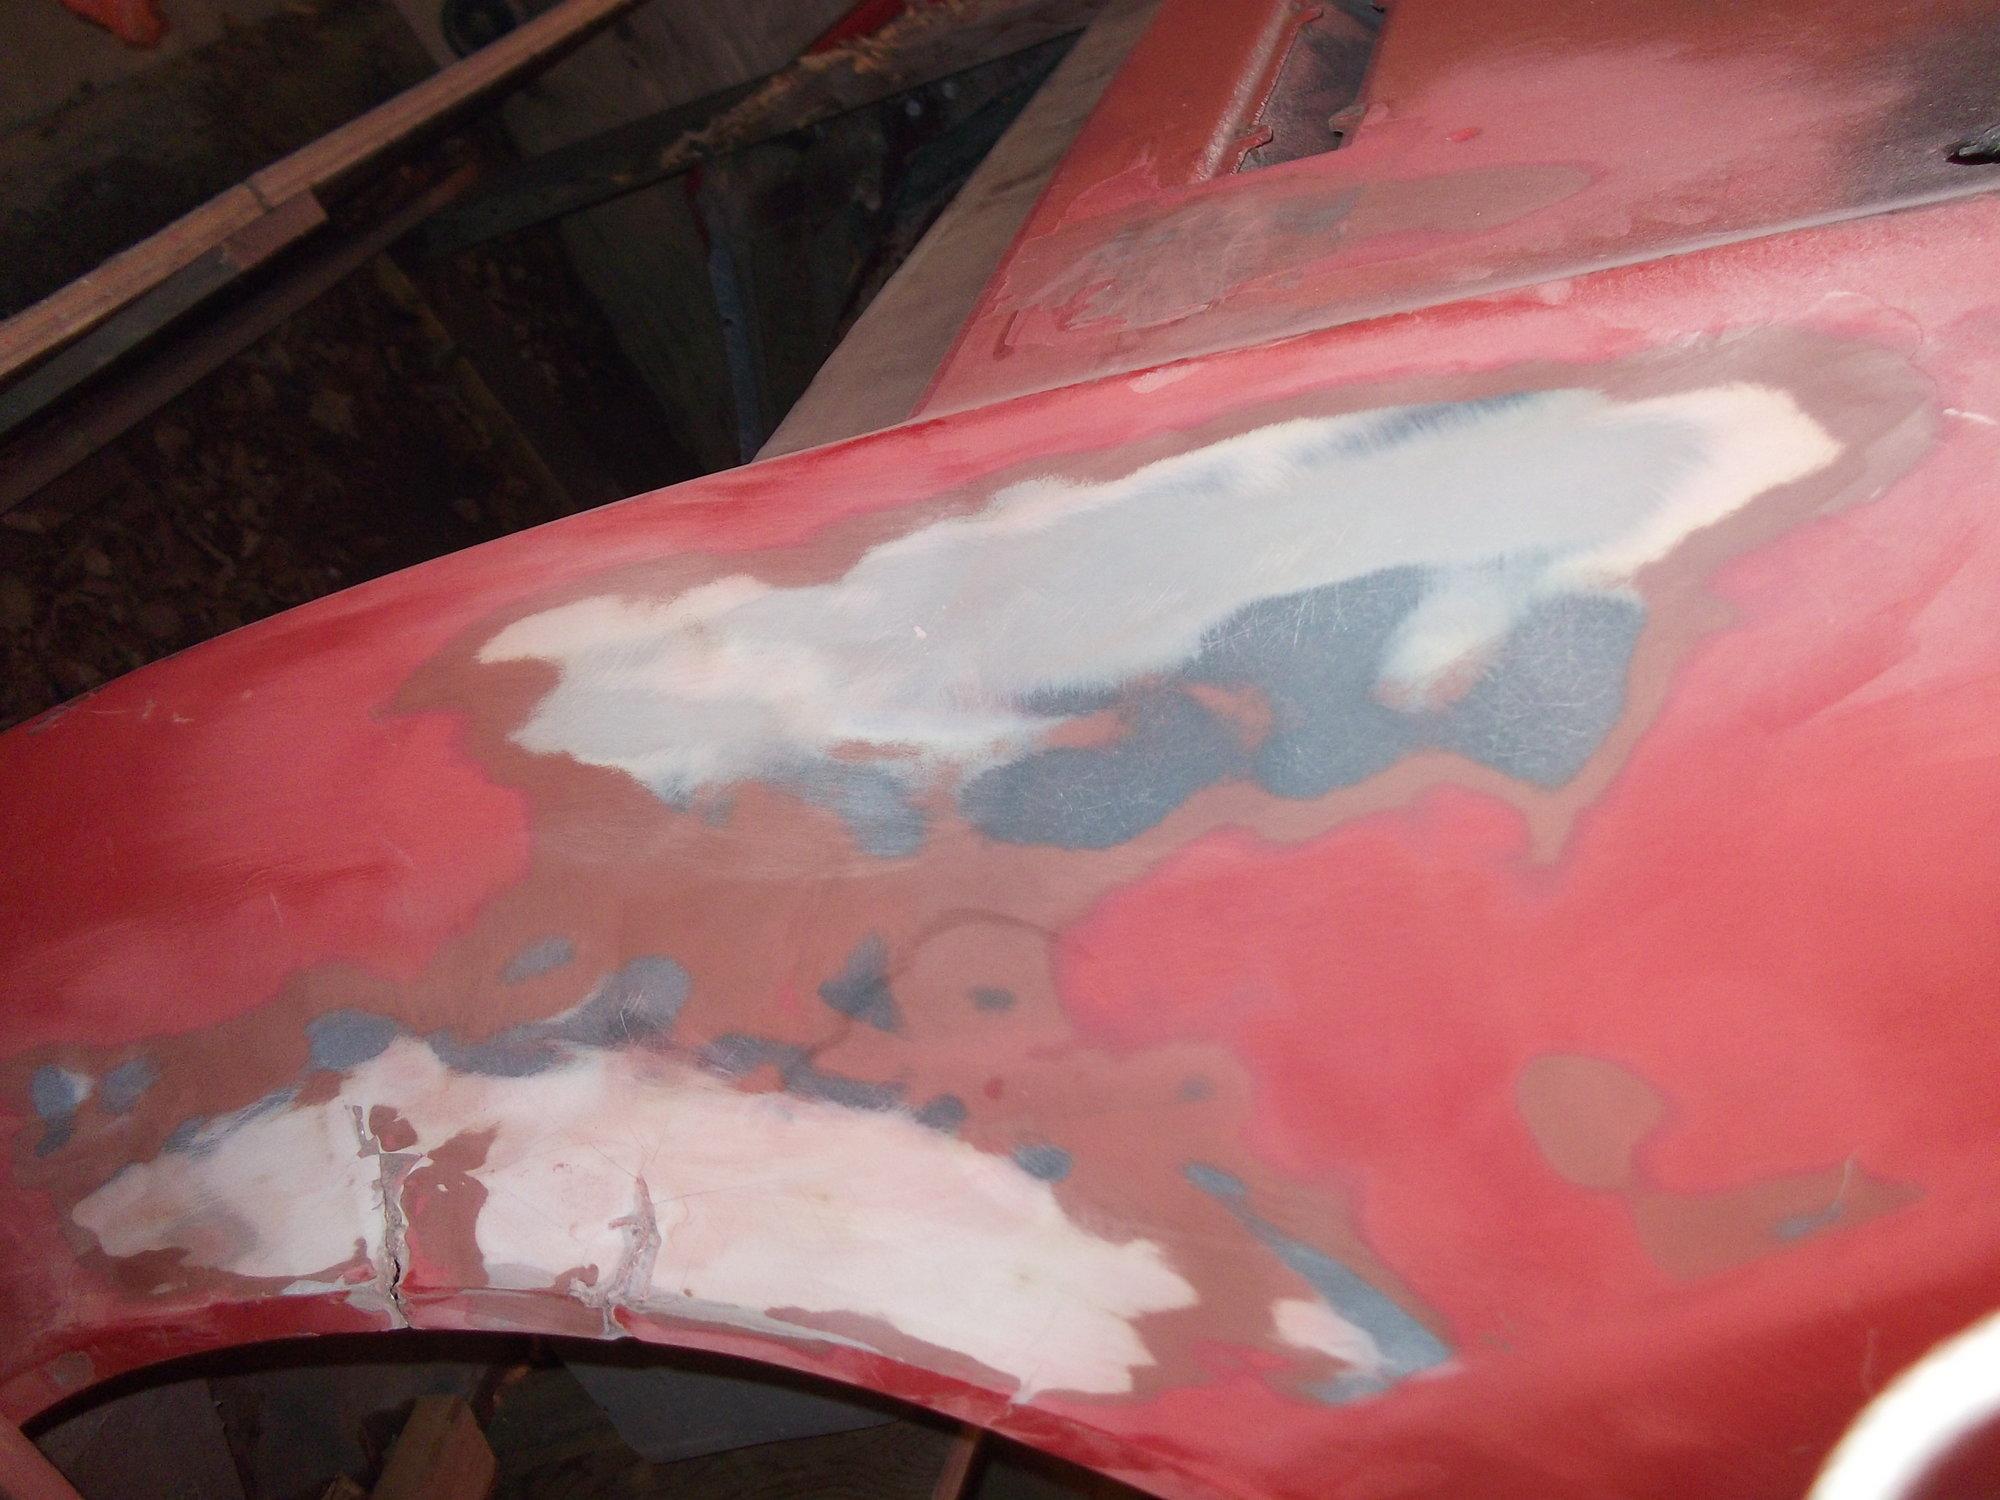 Priya's 79 chrome bumper conversion project - CorvetteForum